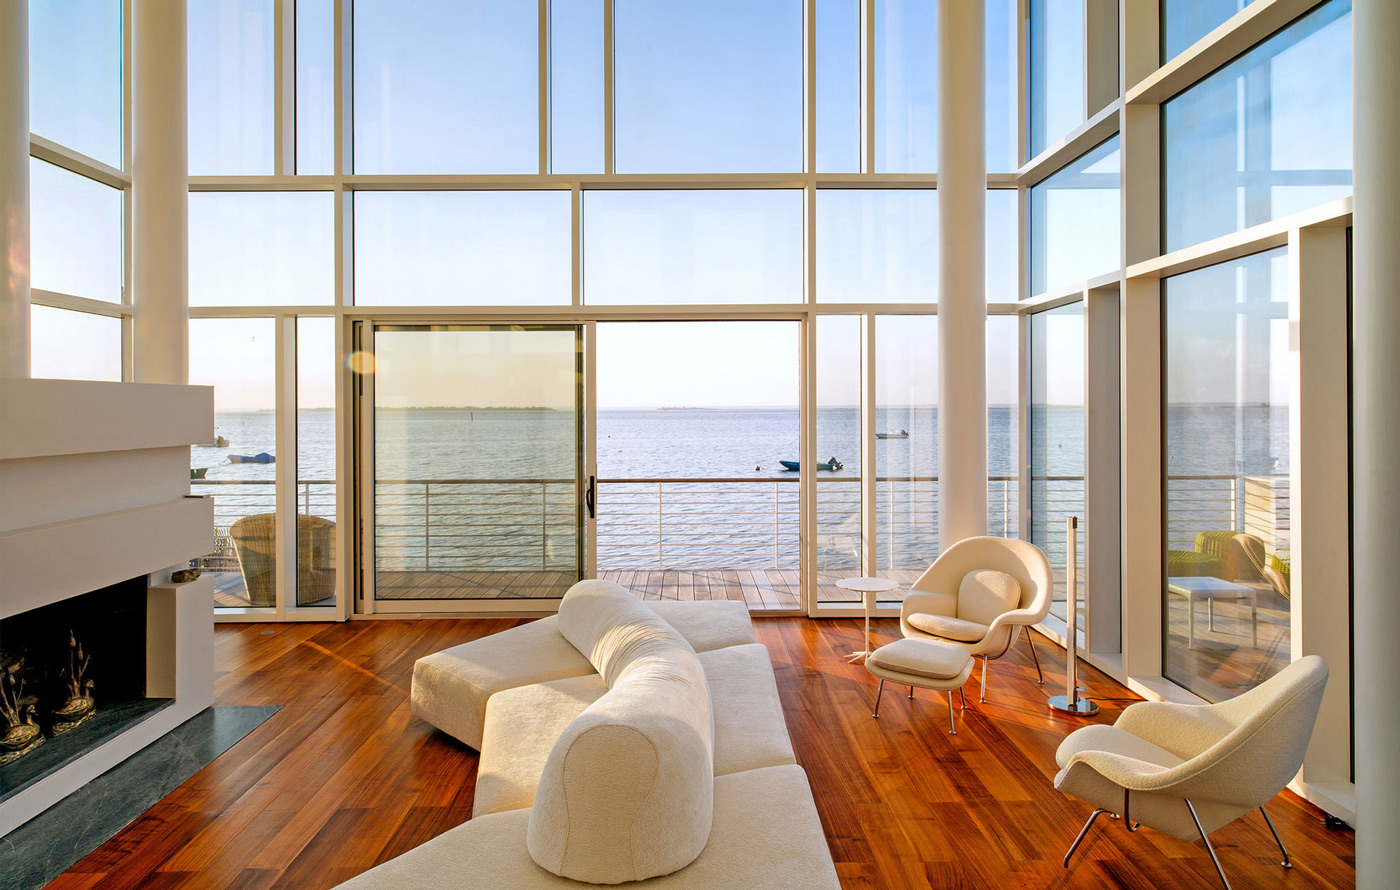 Living Room, Fireplace, Dark Wood Flooring, Glass Walls, Richard Meier's Fire Island House